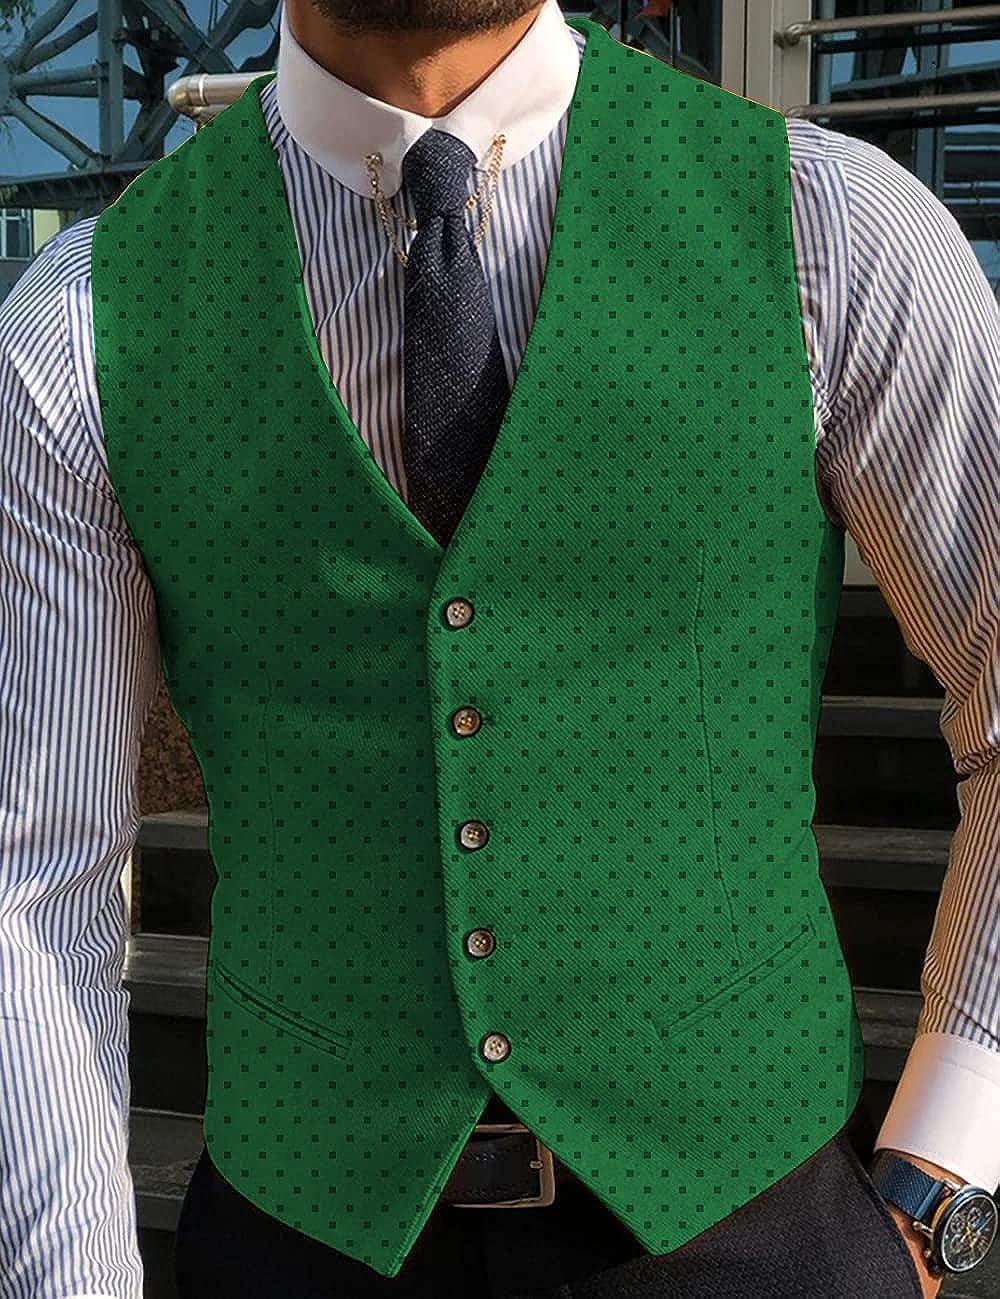 Fashion Men's Suits Vest Solid Black Dot Formal Waistcoat Business Wedding Groomsmen